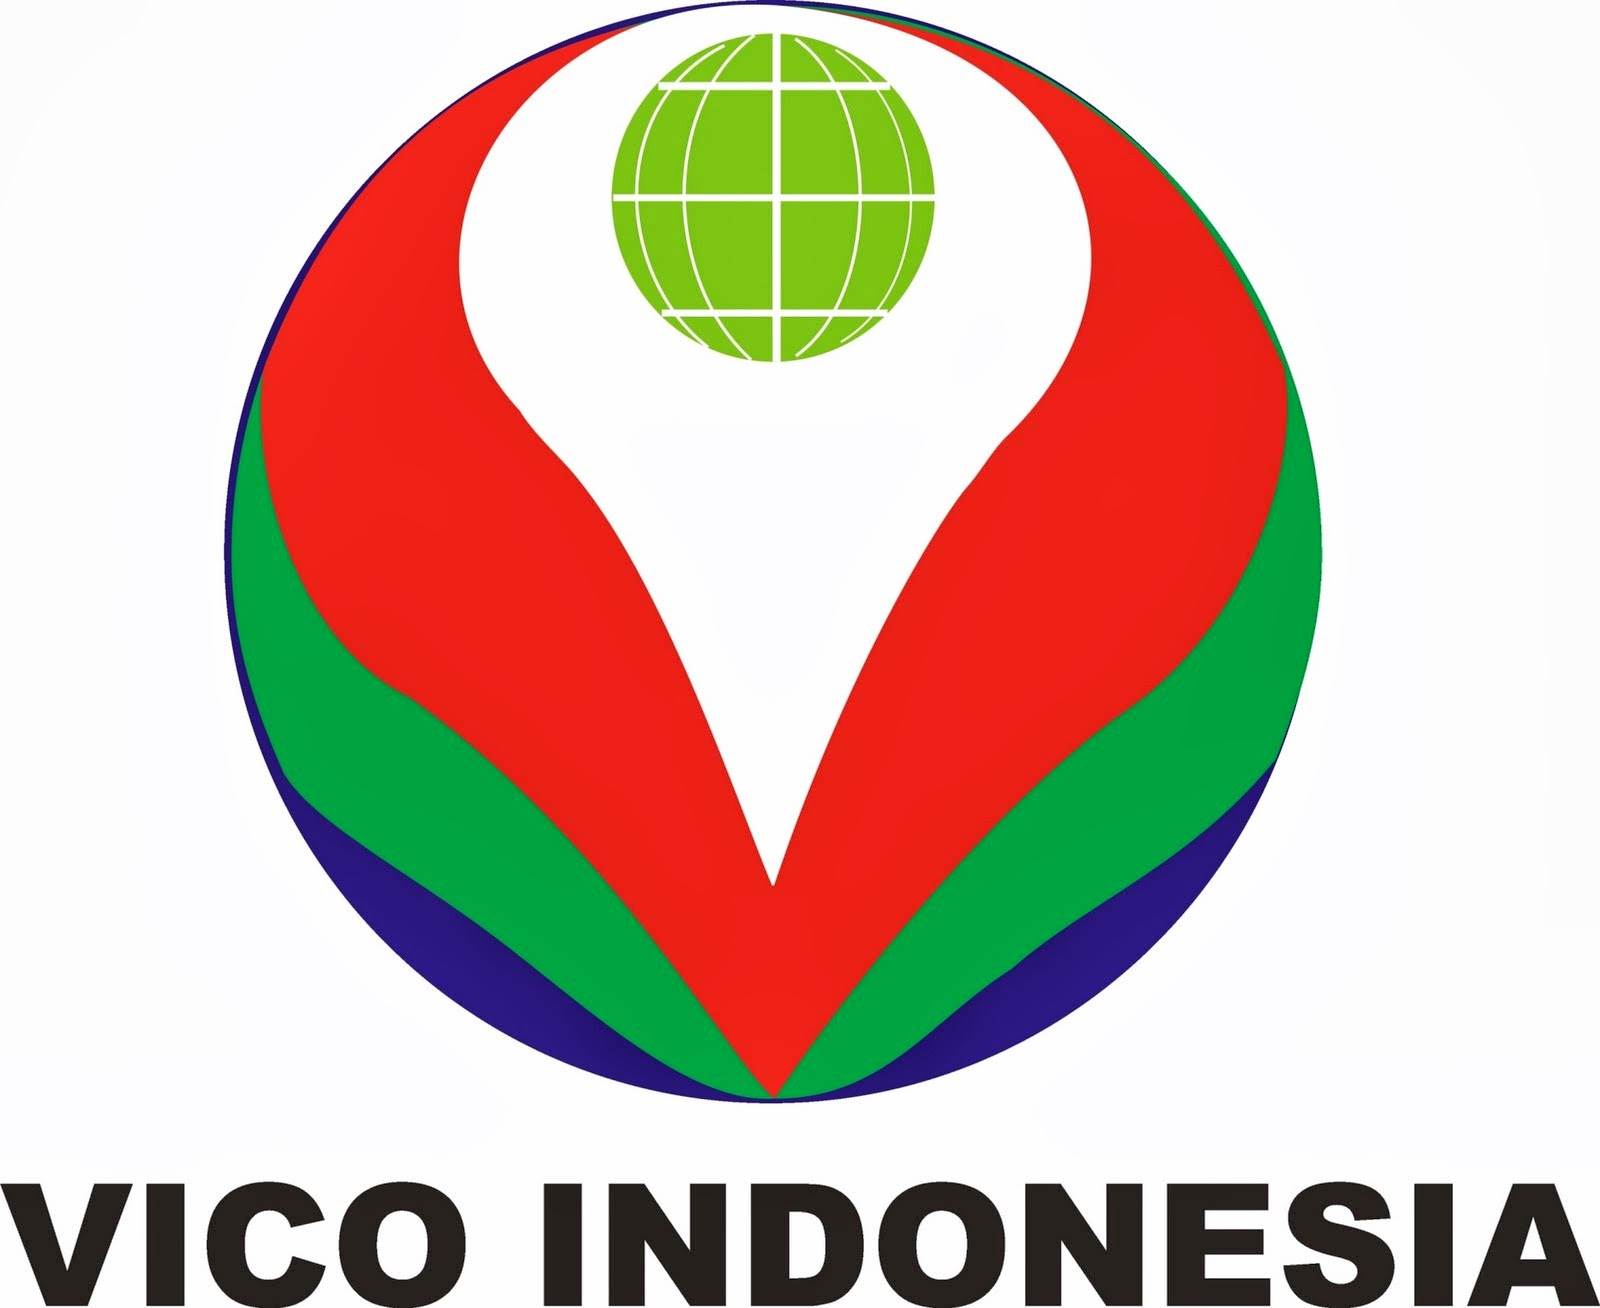 logo indonesia gambar logo